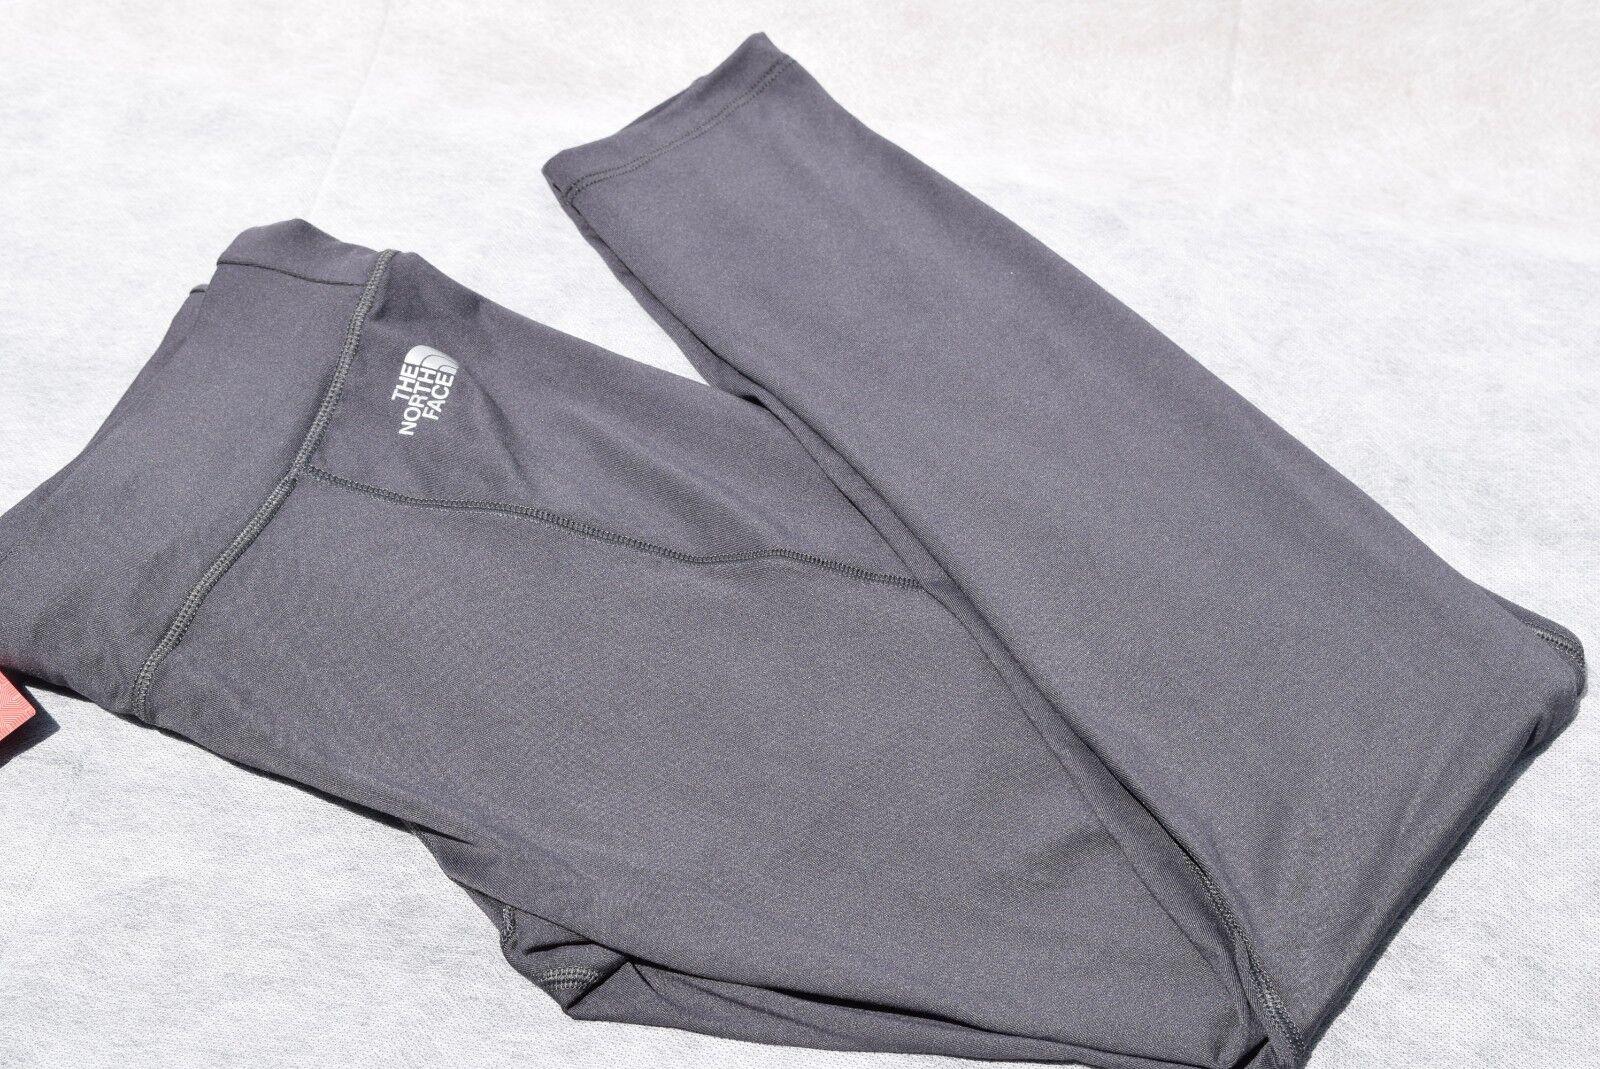 NWT Womens North Face On The Go Leggings RTO Pant sz XS-L Asphalt Grey Slim Fit